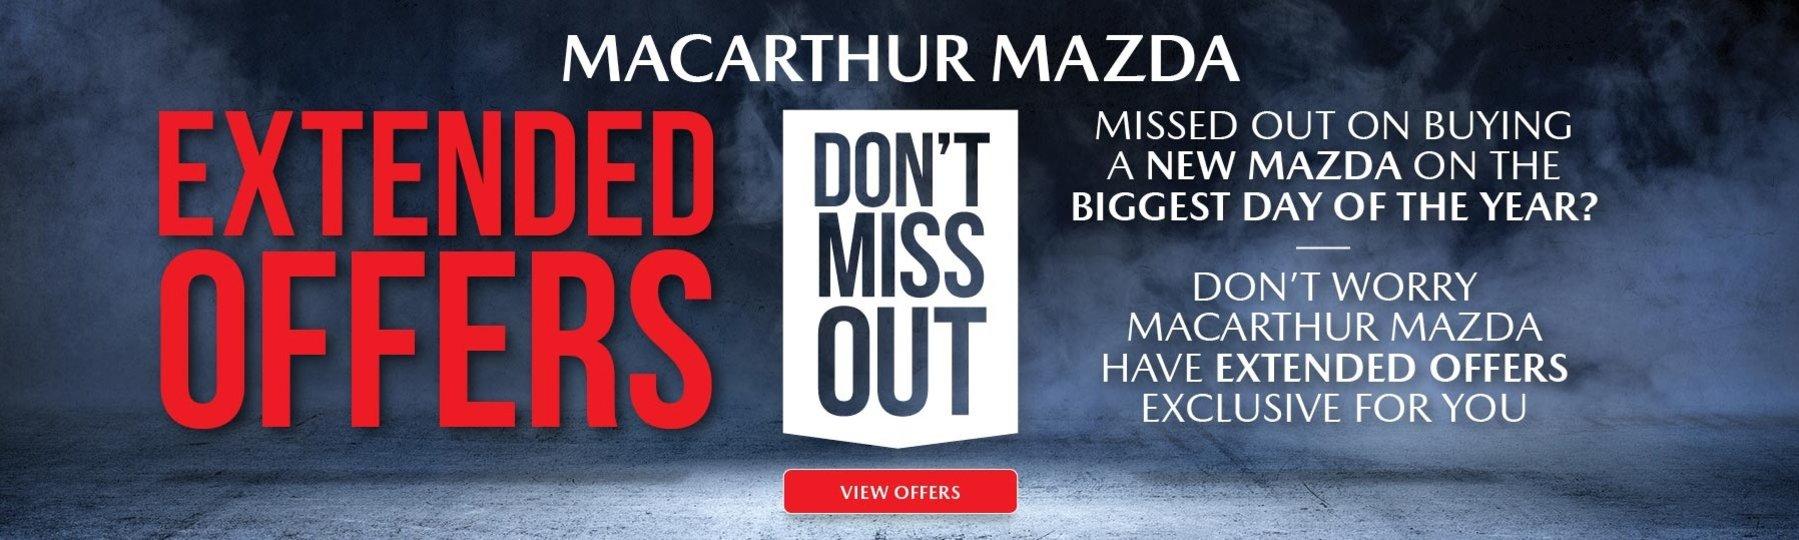 Macarthur Mazda - Extended Sale